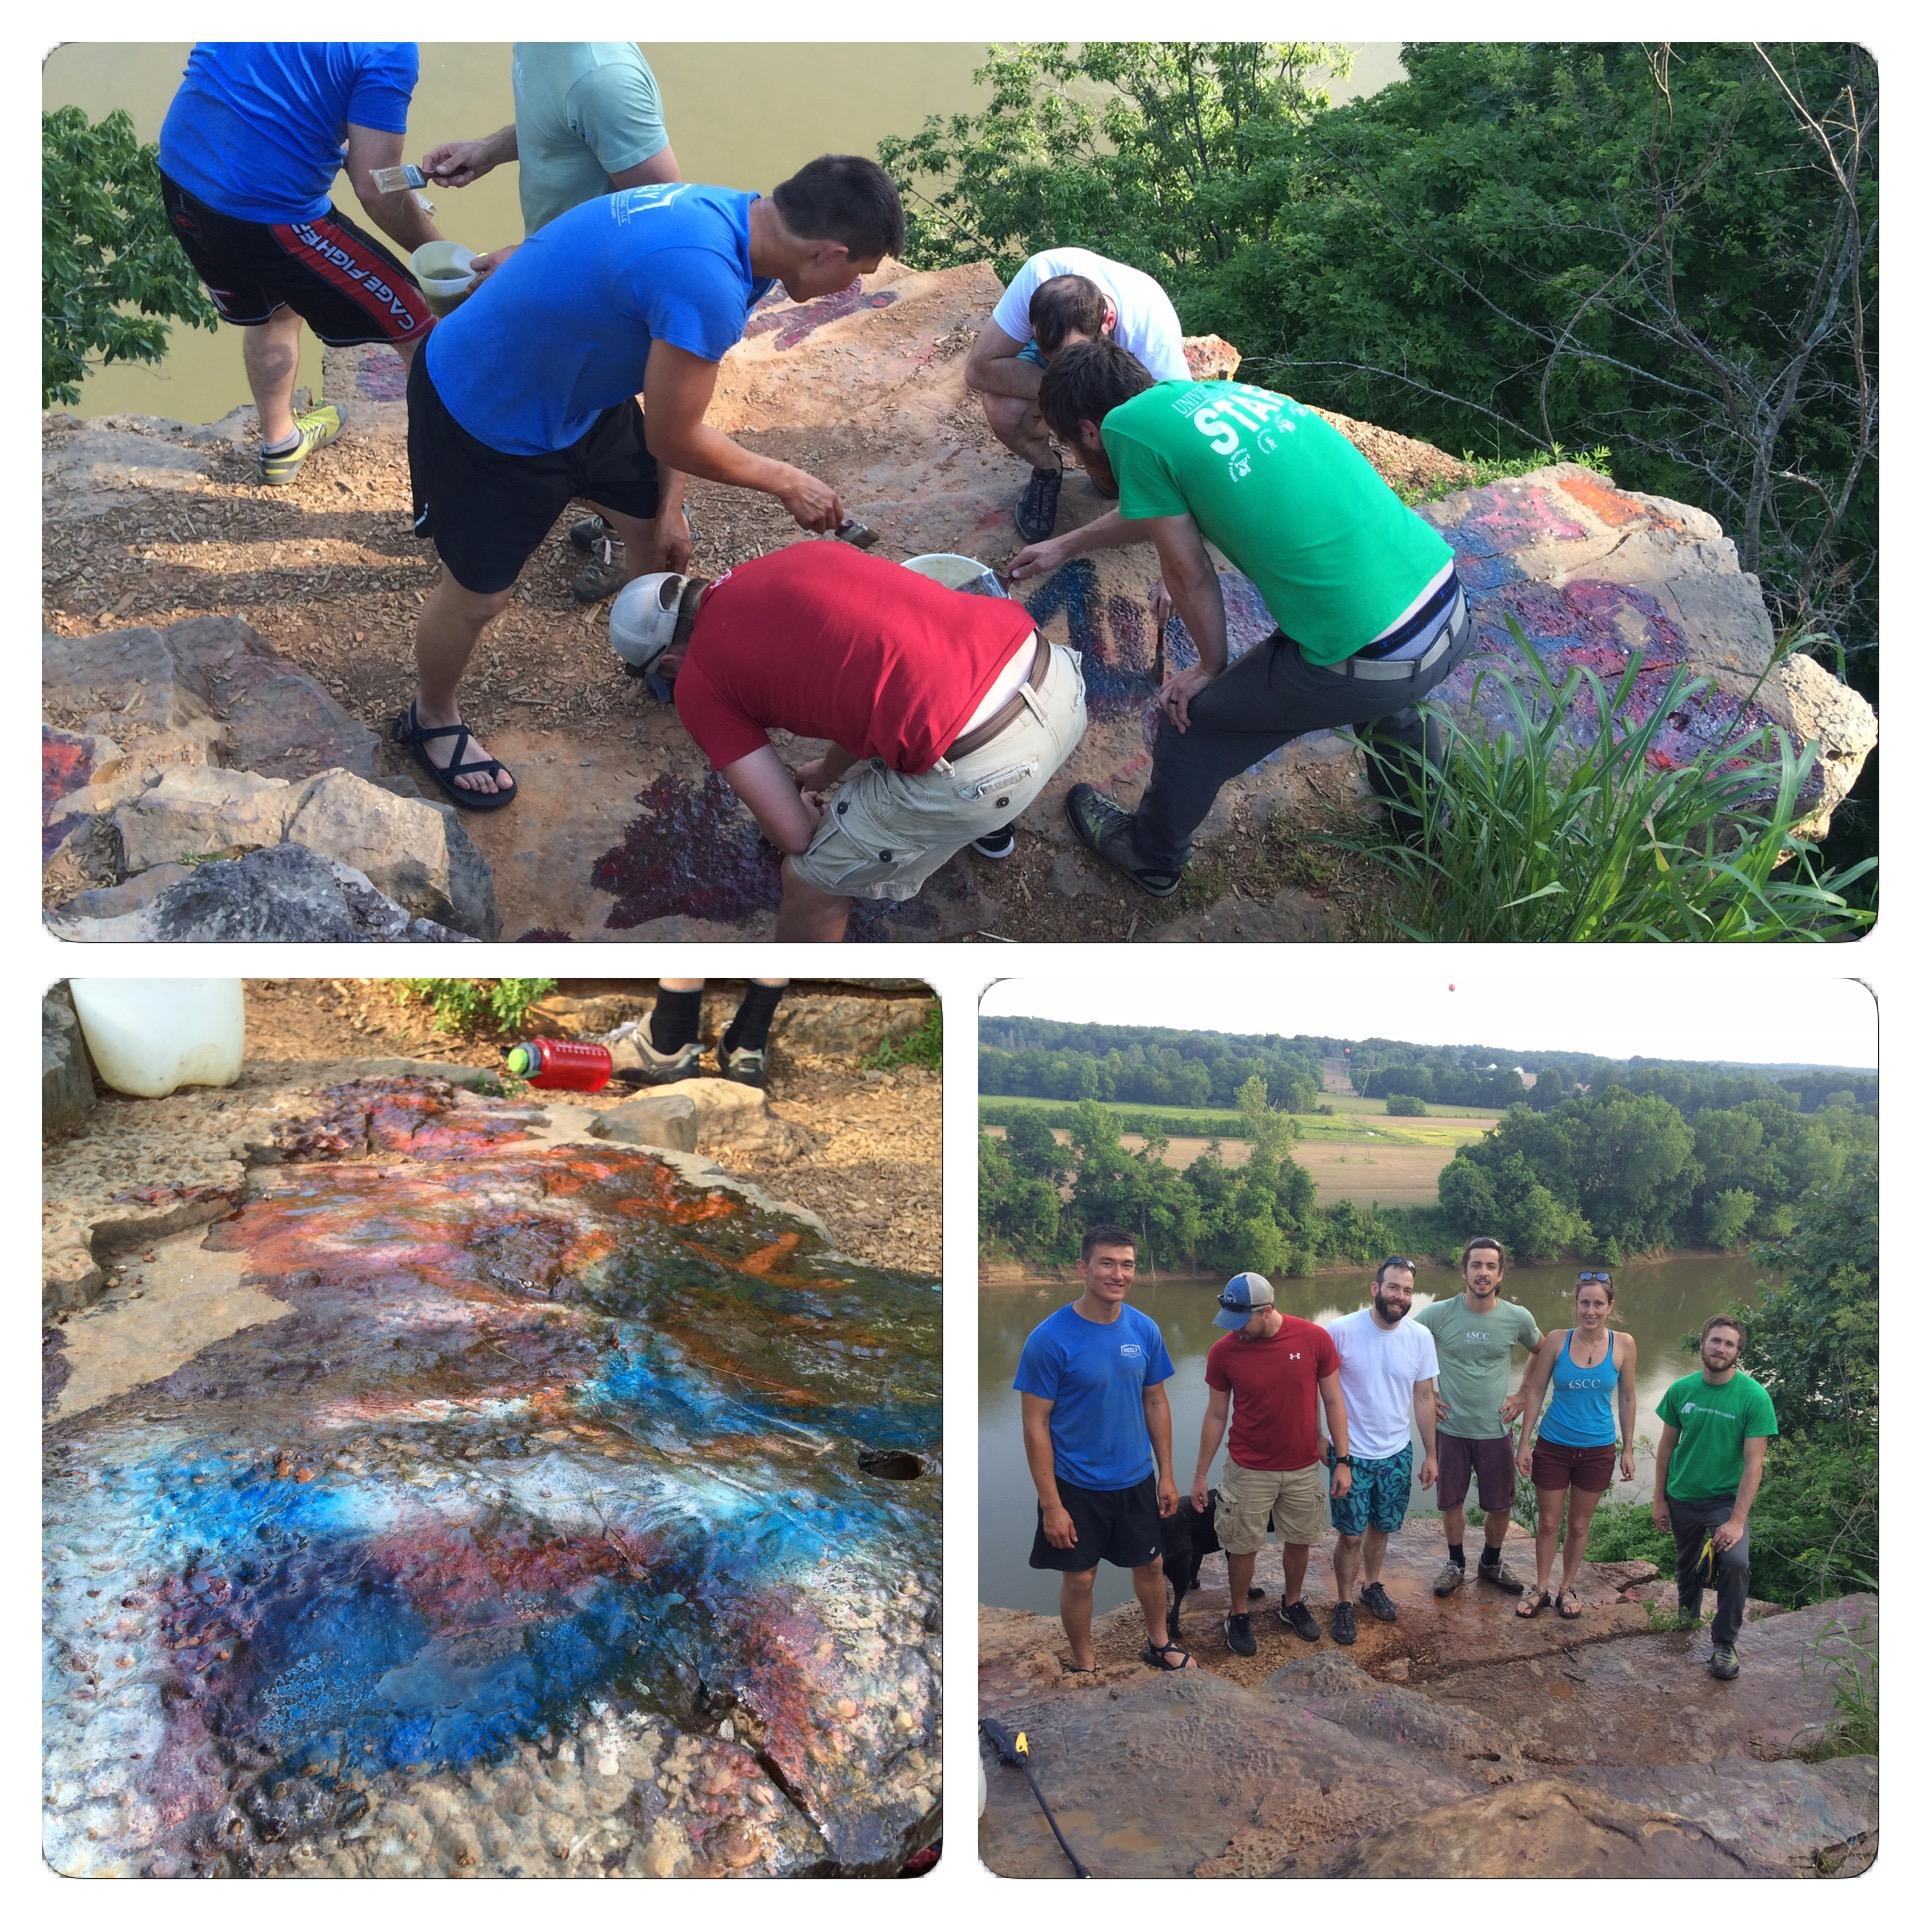 Copy of Kings Bluff graffiti removal- 5-24-16 023 (1).JPG